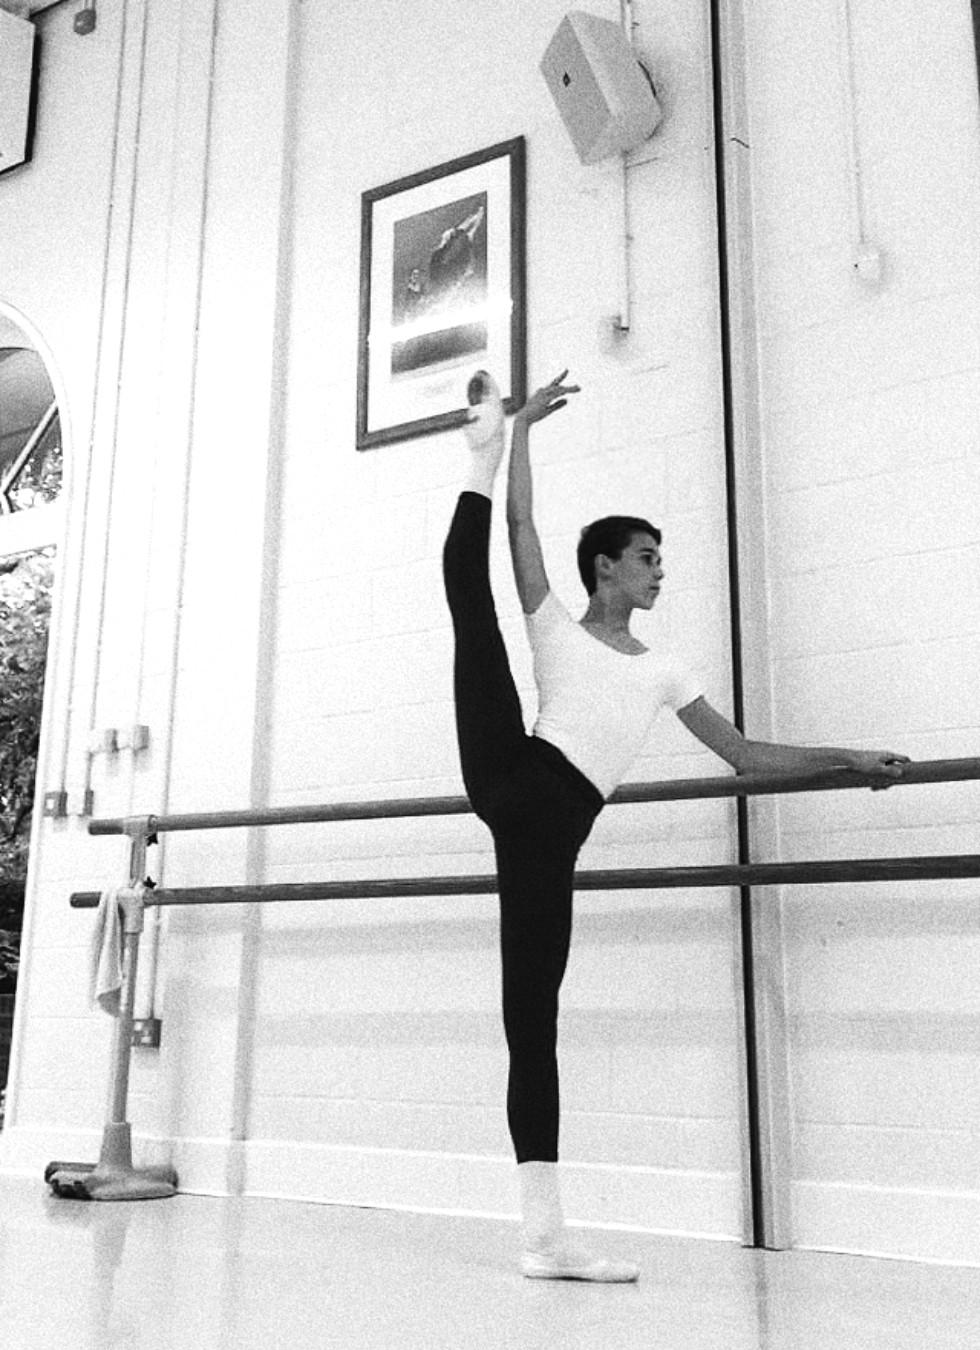 martín díaz álvarez danza clásica anna generalova escuela internacional international dance school alicante royal